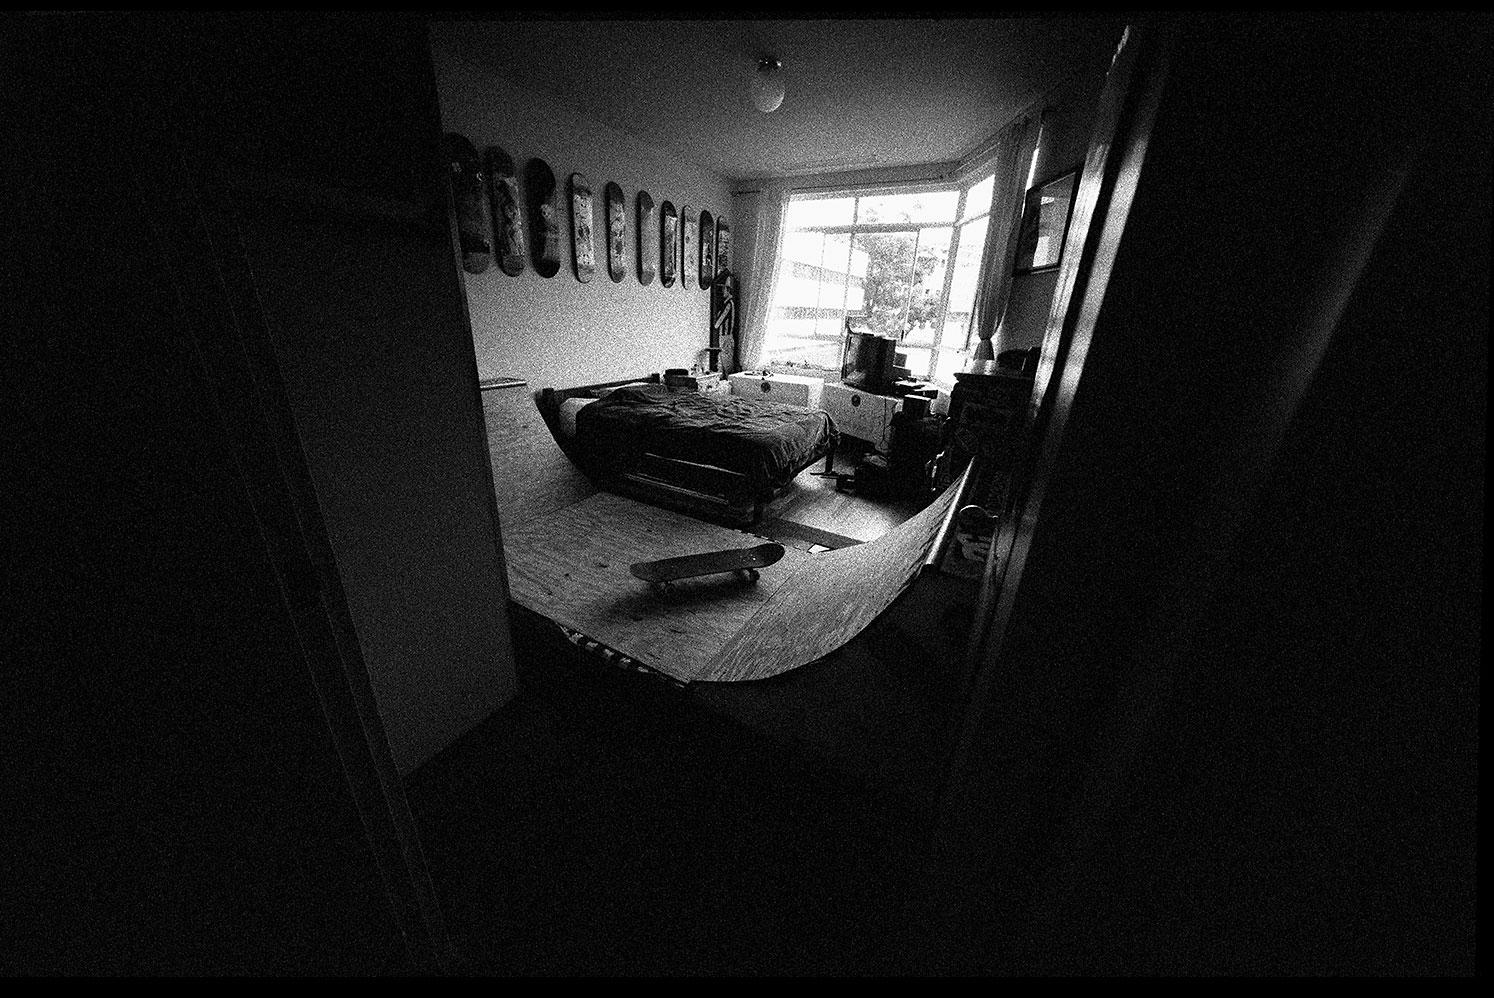 Bedroom Ramp, Waterloo, NSW, Silver Gelatin Print, 50.8cm x 60.1cm, 1/5